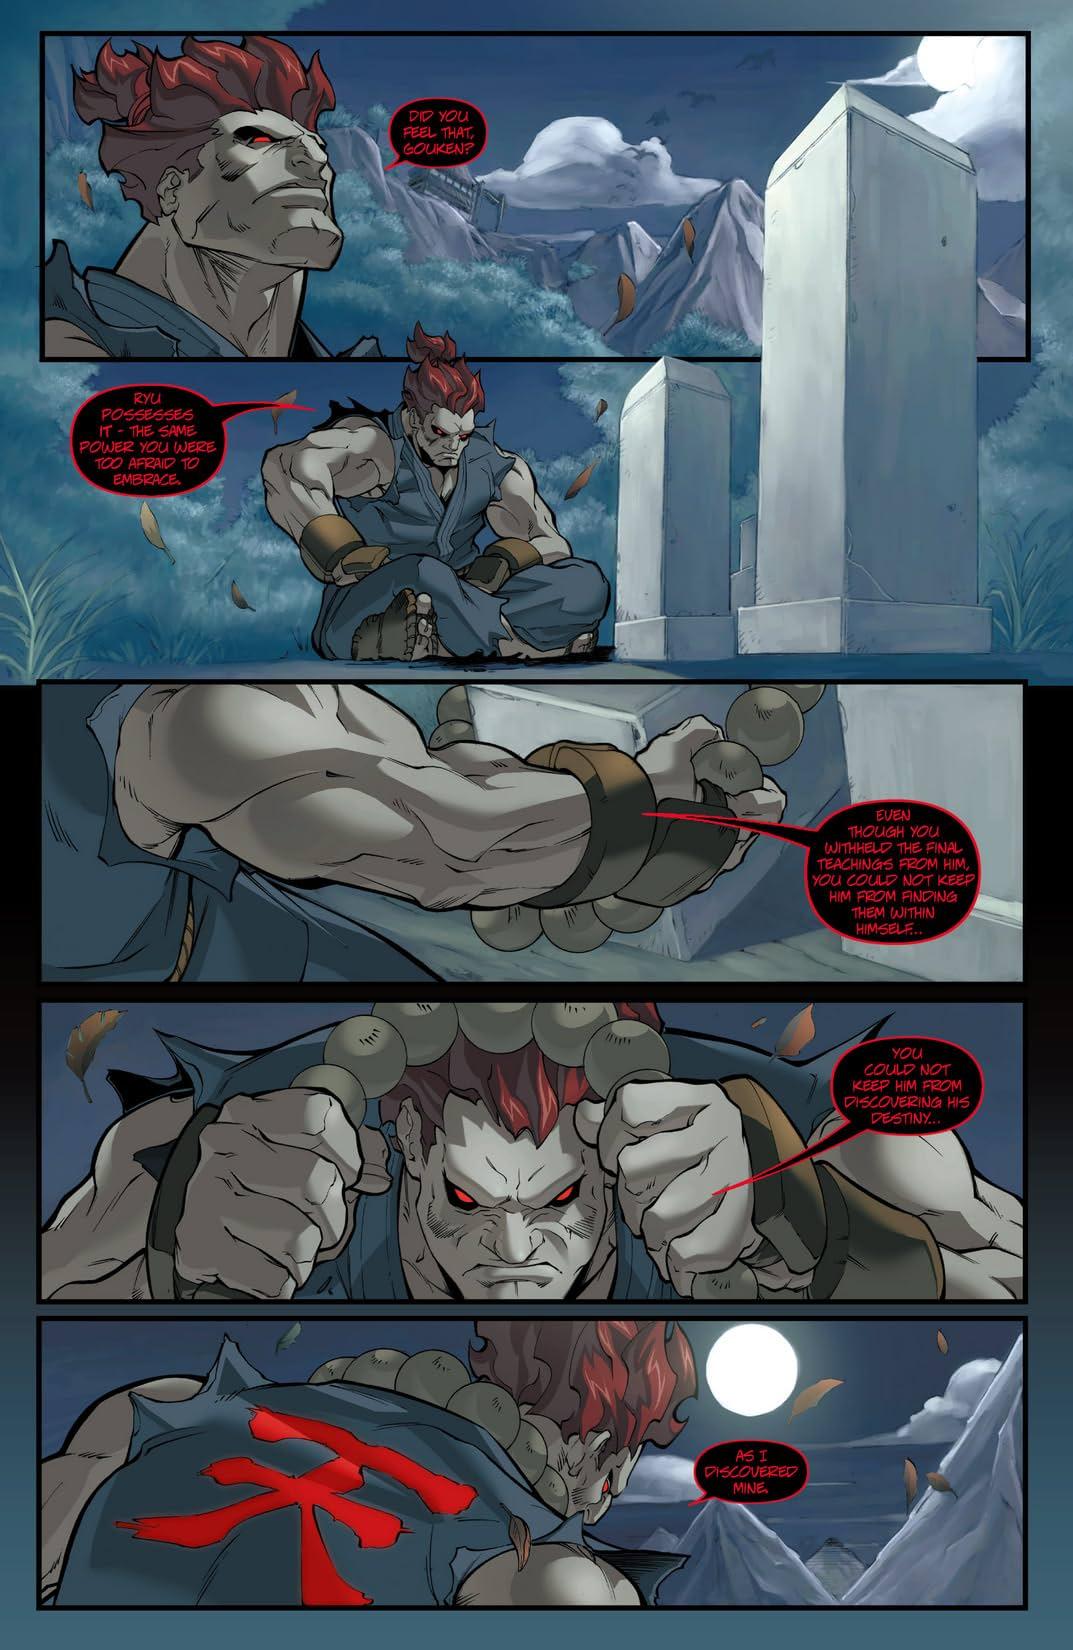 Street Fighter #3